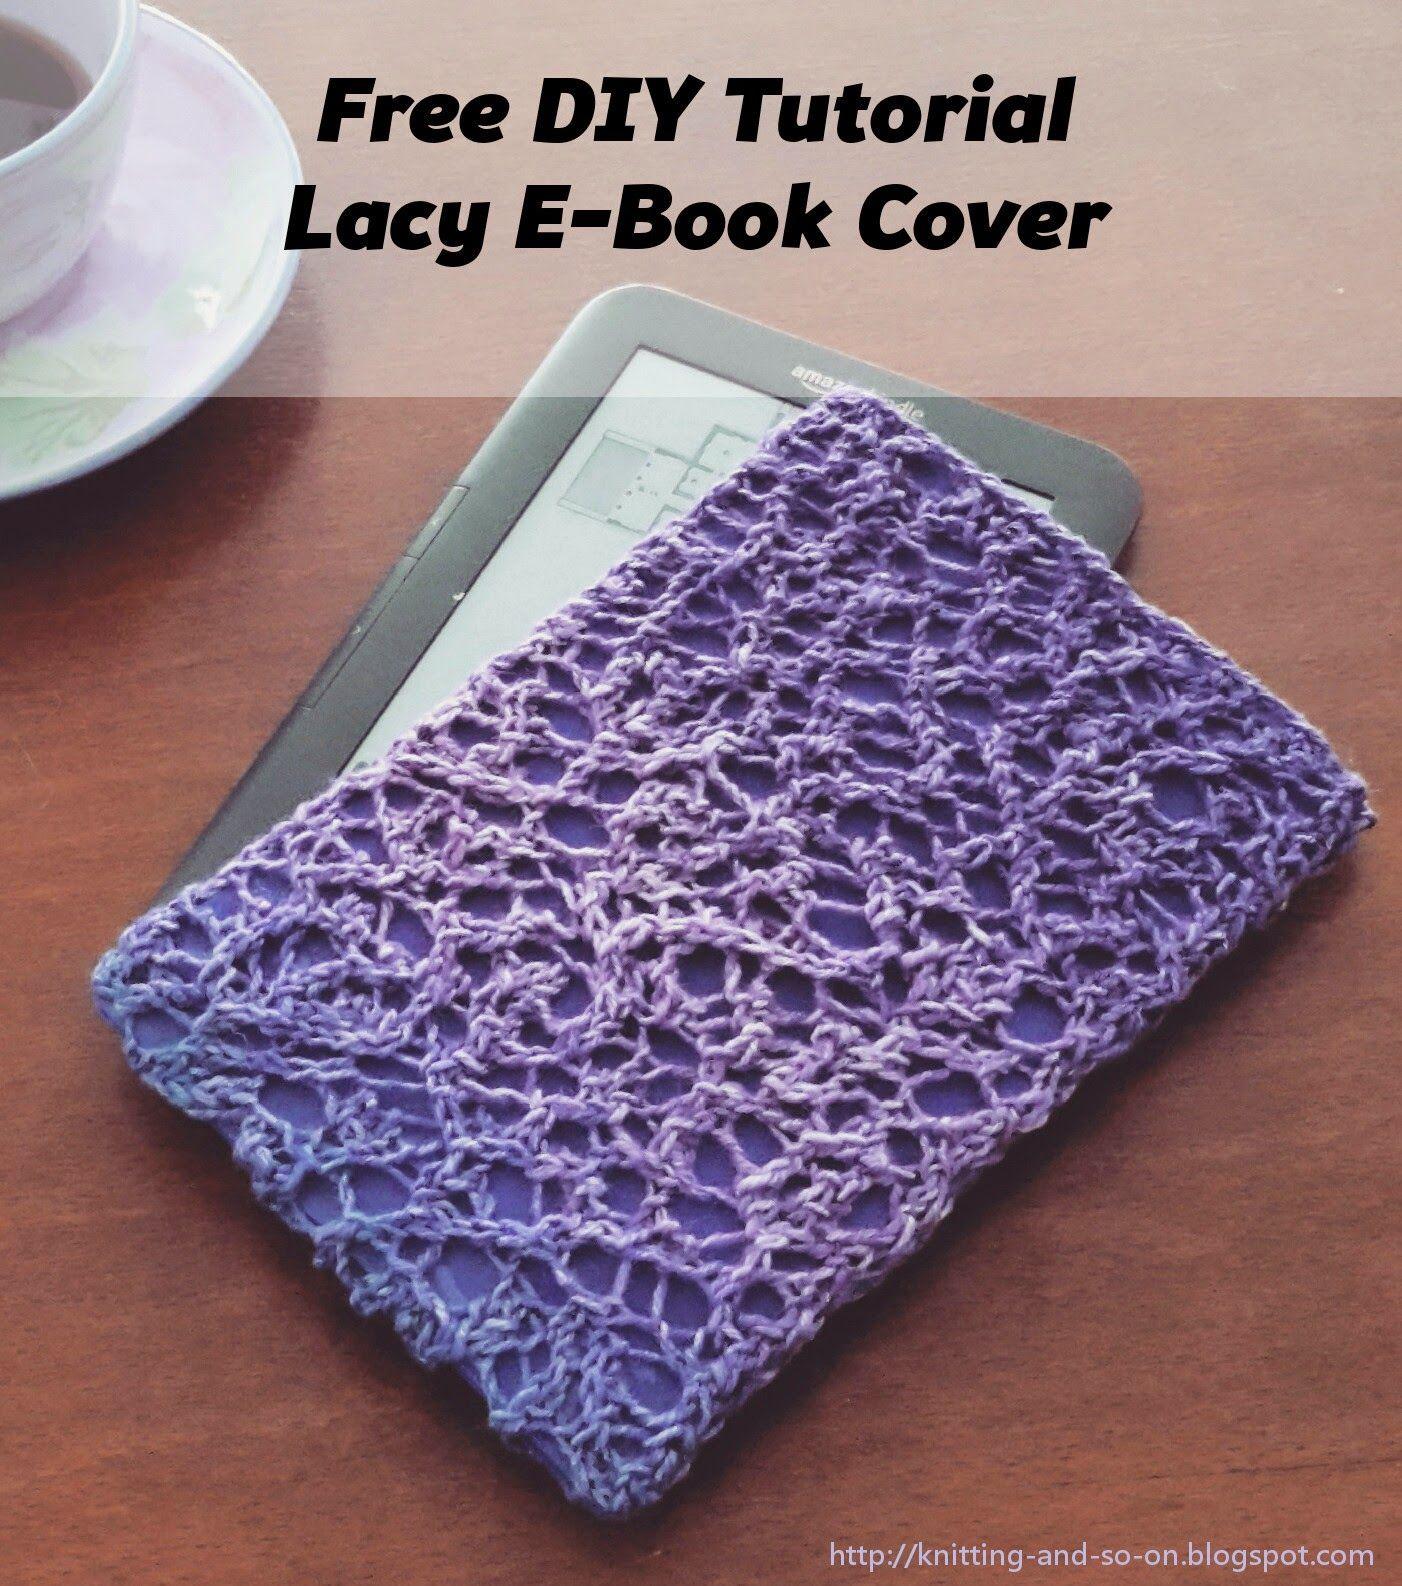 Free DIY Tutorial: Lacy E-Book Sleeve